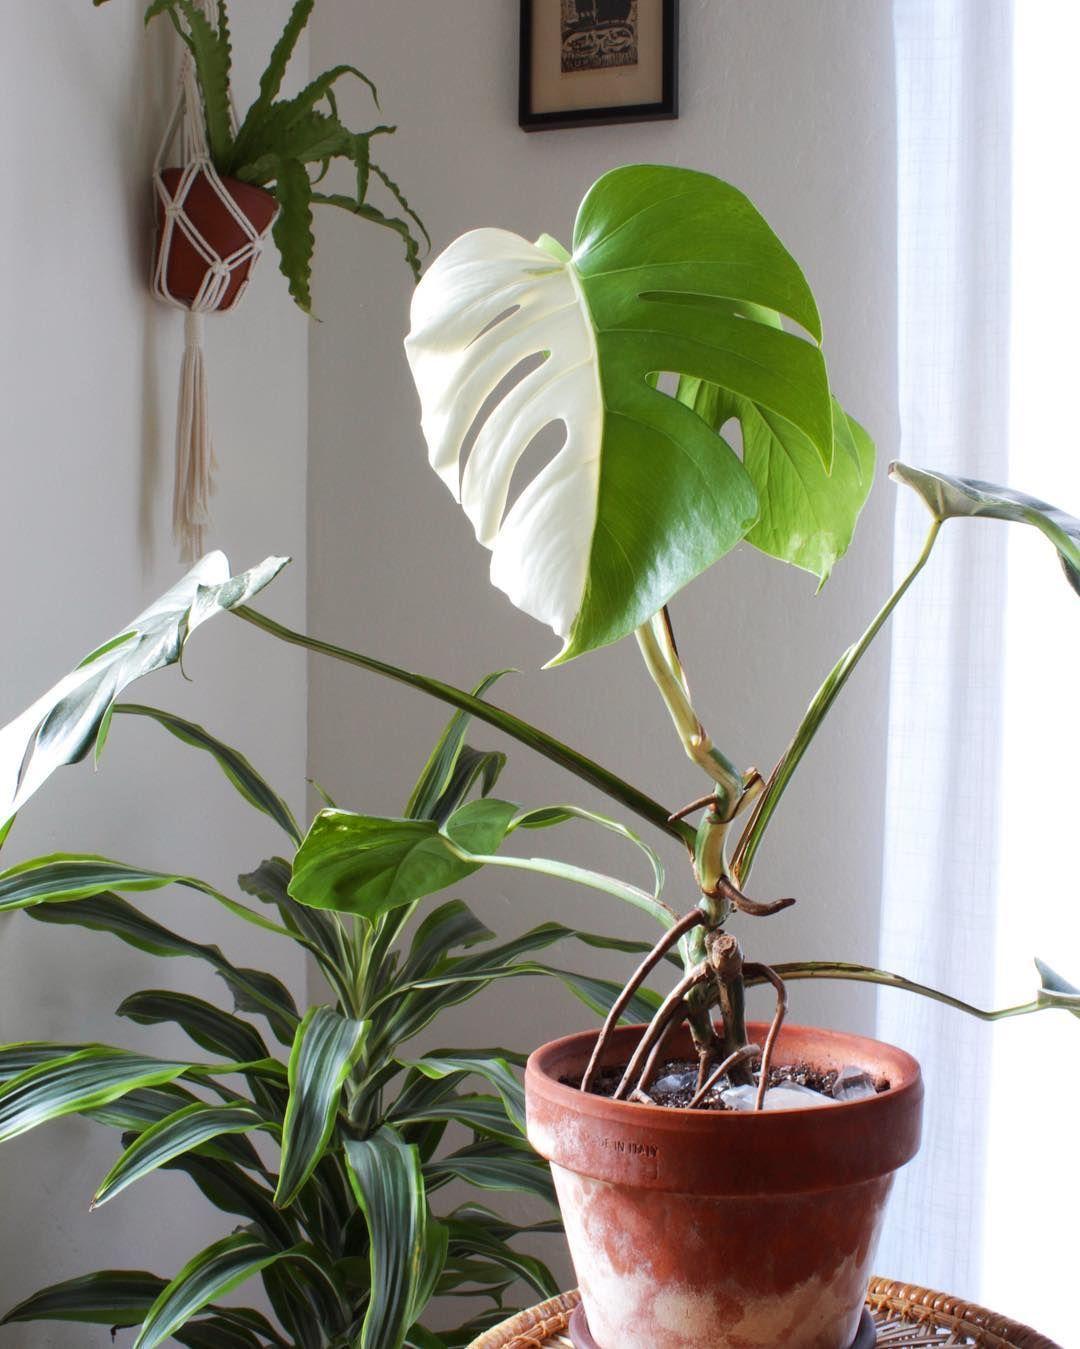 monstera deliciosa variegata a little slower and harder to. Black Bedroom Furniture Sets. Home Design Ideas